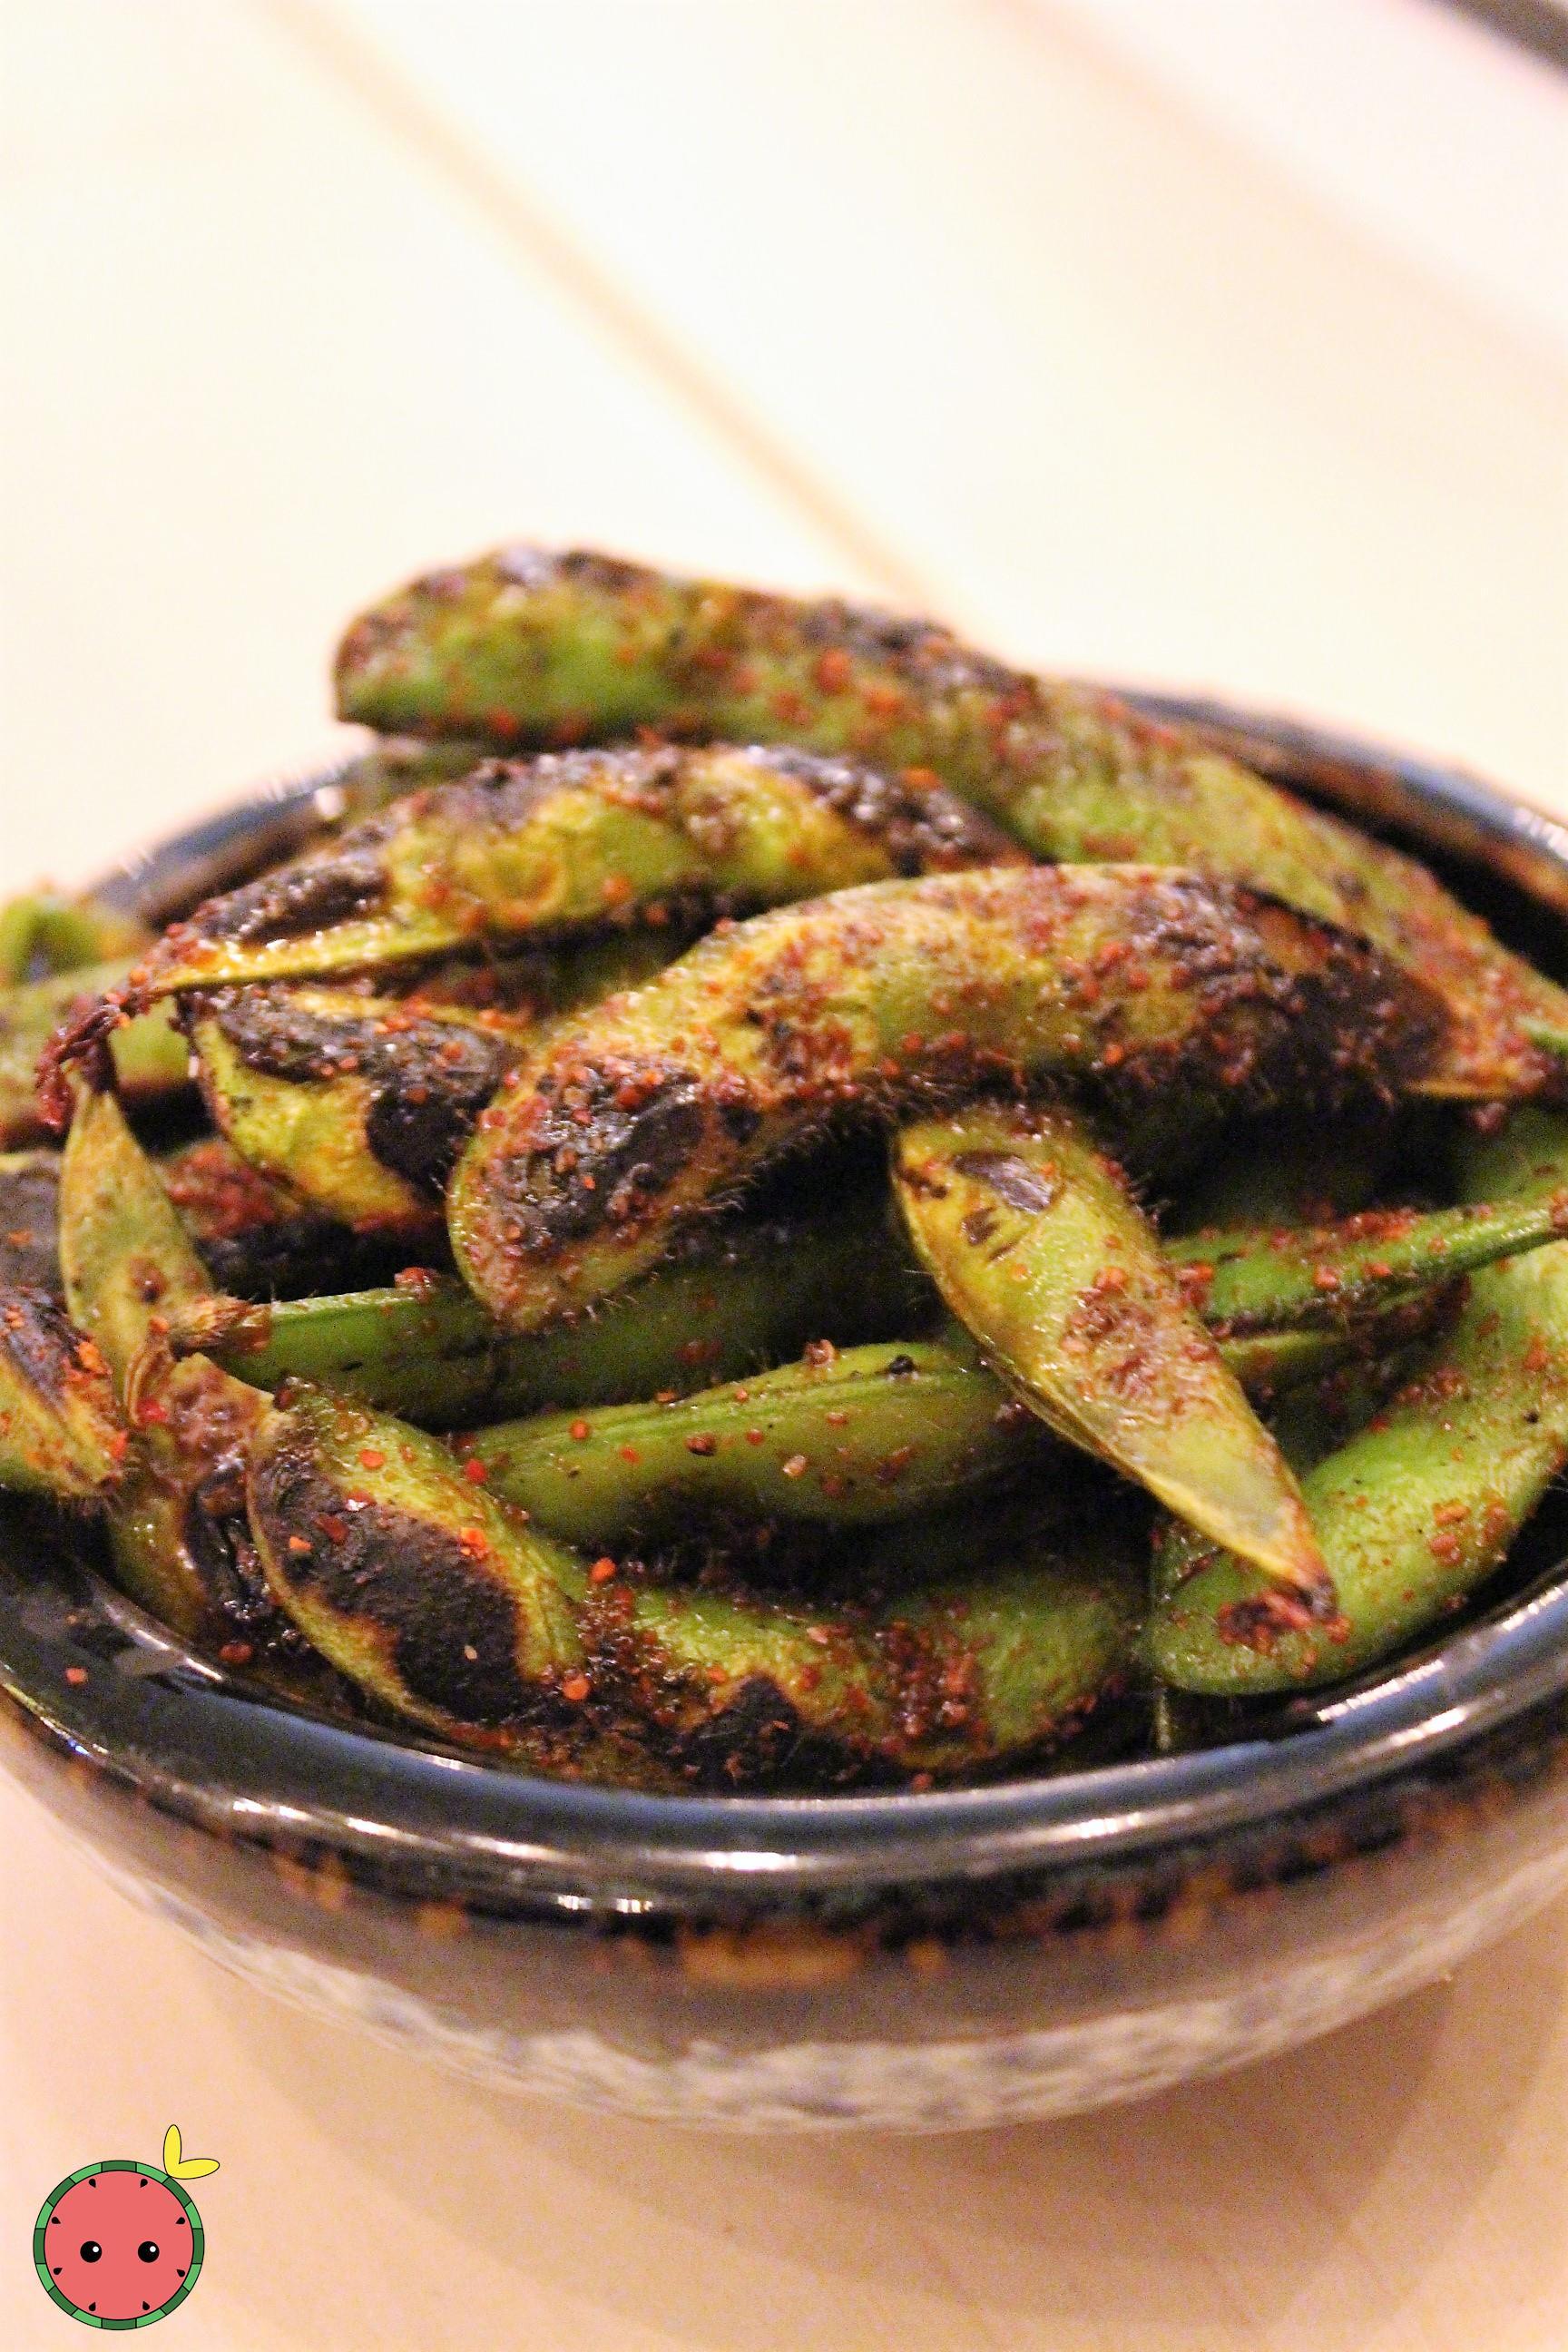 Spicy Charred Edamame